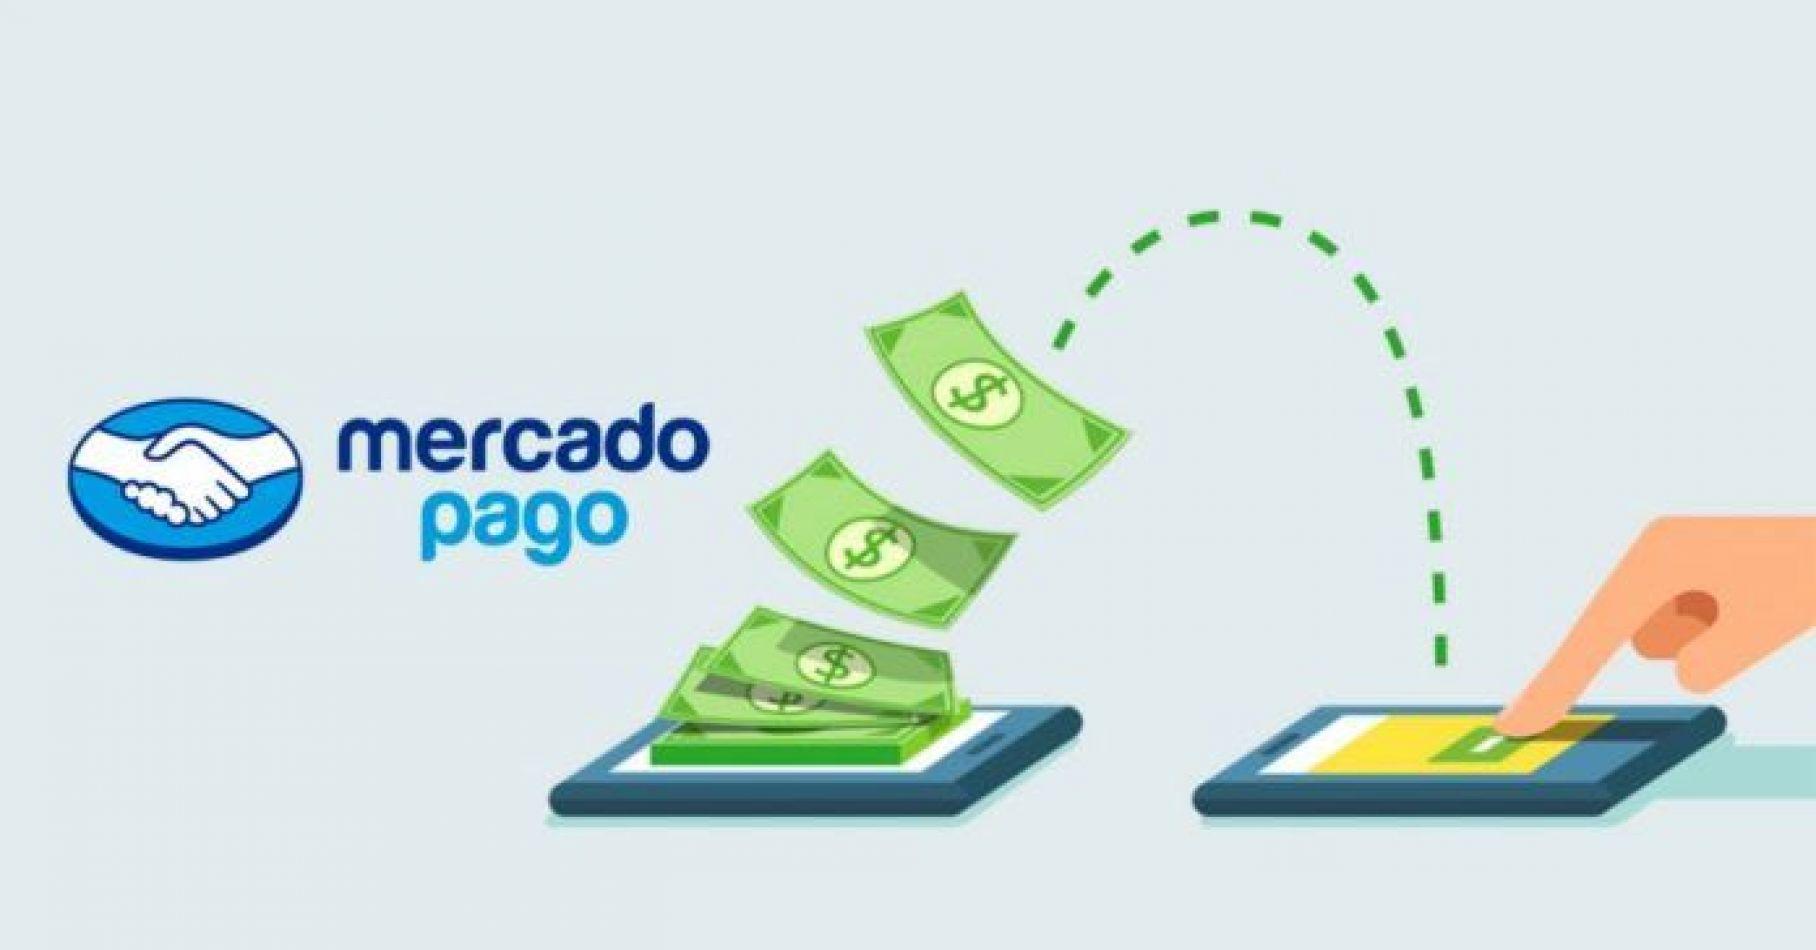 Mercado Libre le descontó plata a los usuarios